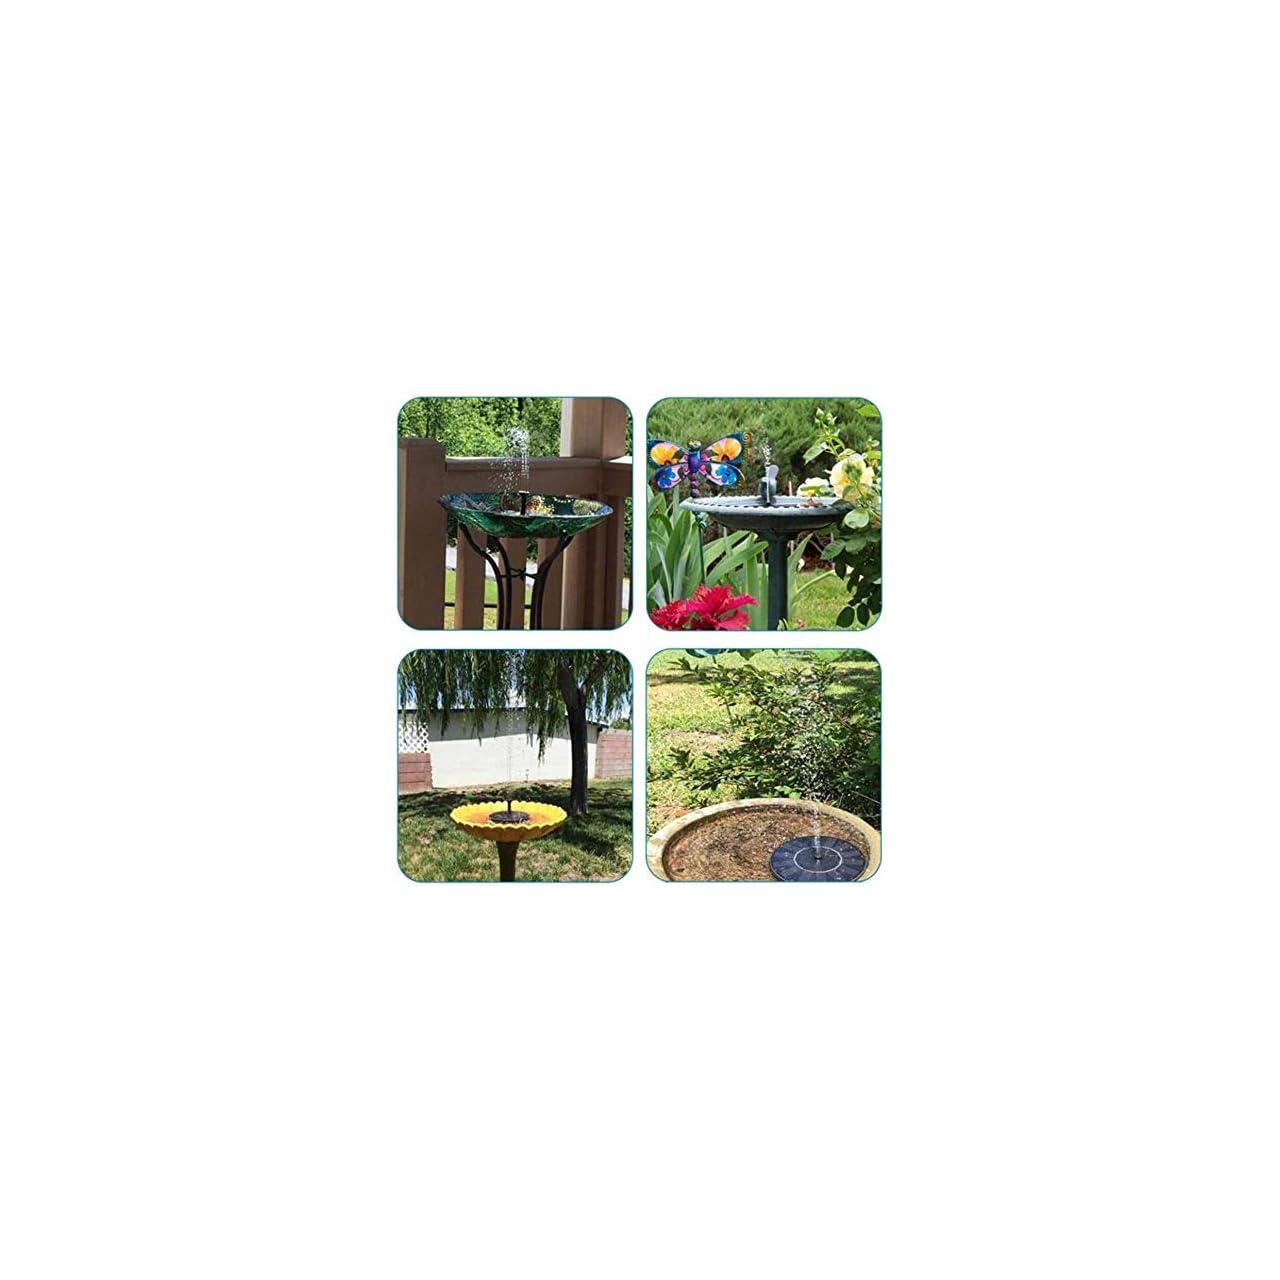 Kawai Solar Fountain Pump, Circle Solar Water Pump Floating Fountain for Outdoor Birdbath Ponds Pool Fish Tank Water Cycling Garden Decoration 19